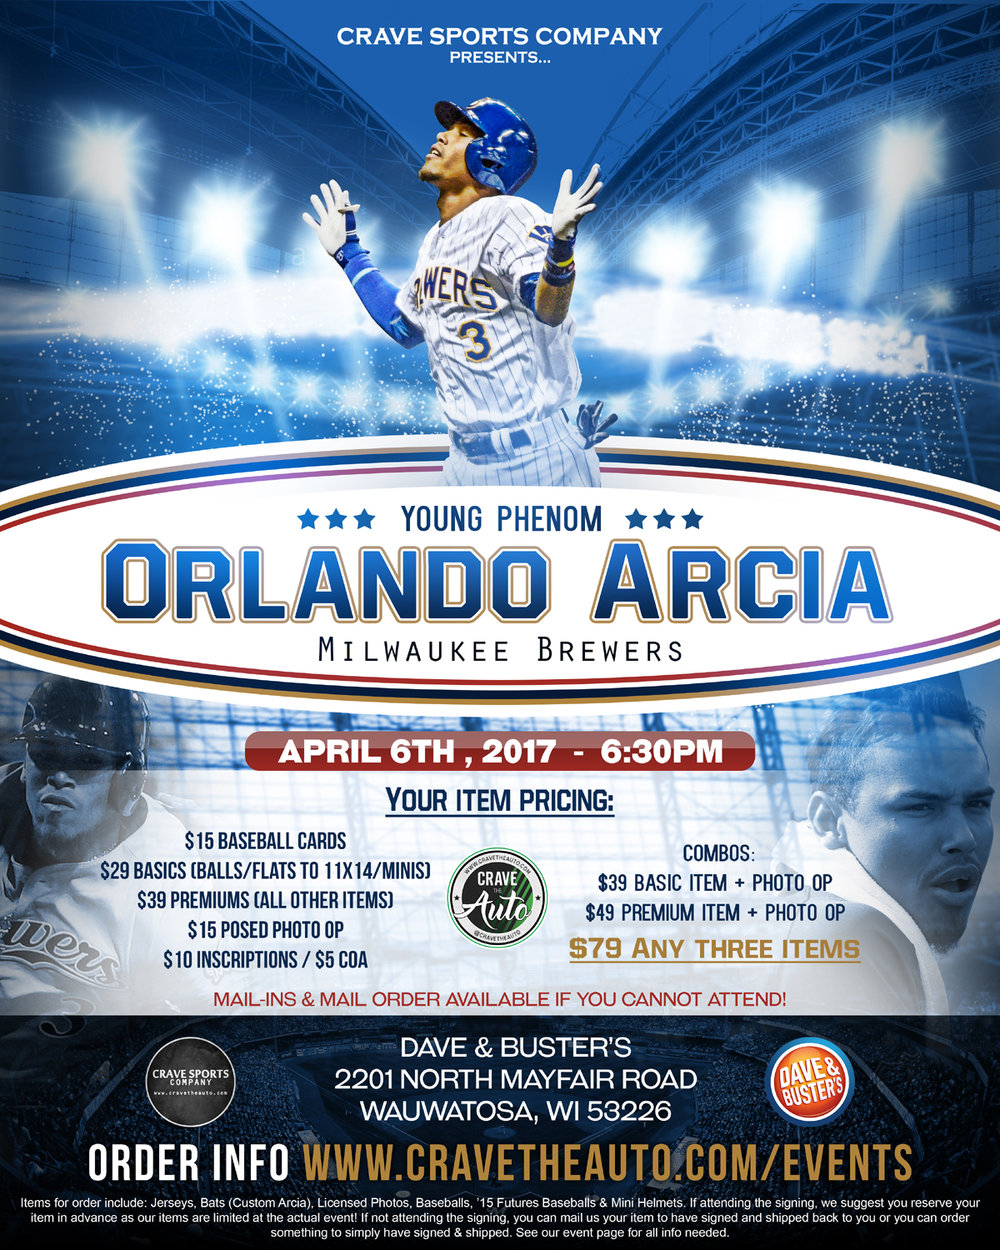 Orlando Arcia Public Signing